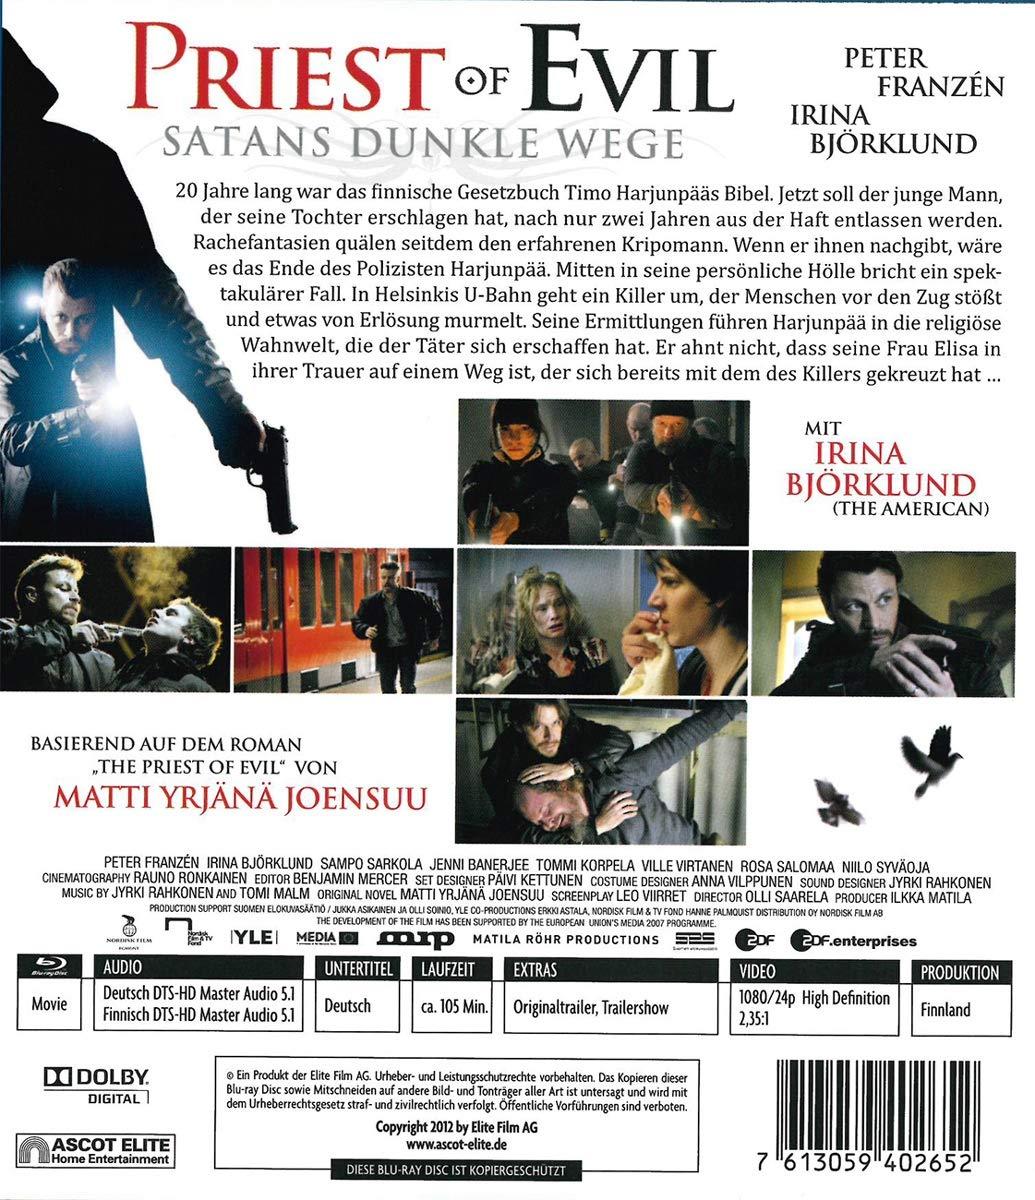 Priest of Evil [Blu-ray] [Alemania]: Amazon.es: Irina Björklund, Peter Franzén, Eero Milonoff, Ville Virtanen, Tommi Korpela, Jorma Tommila, Olli Saarela, Irina Björklund, Peter Franzén: Cine y Series TV